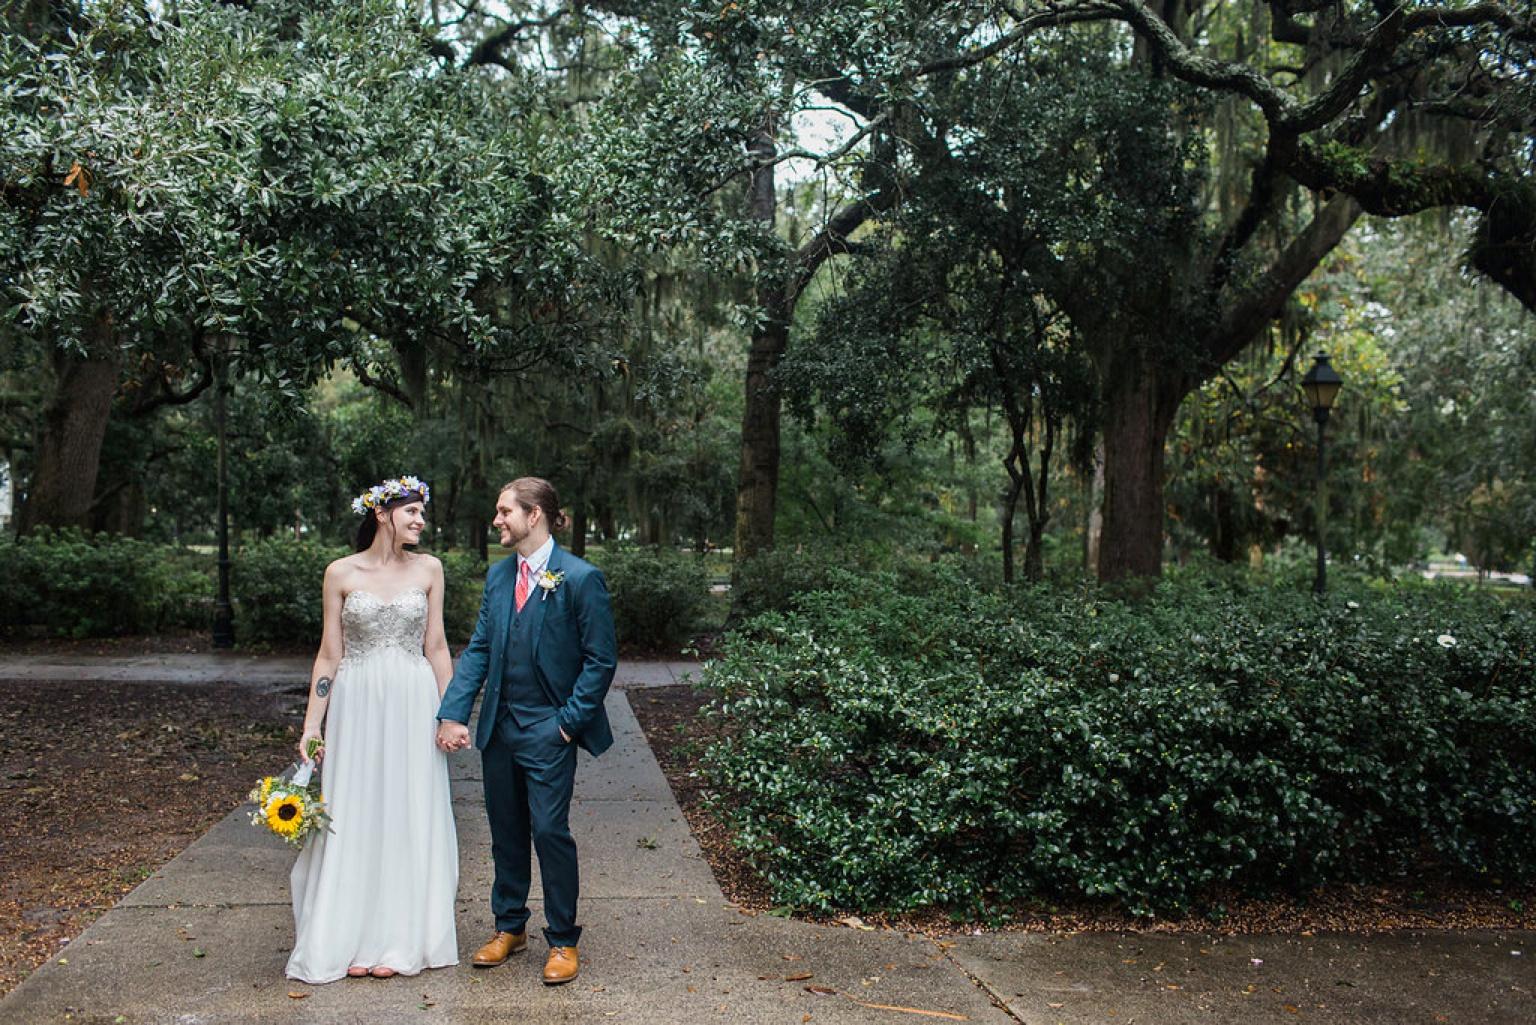 Apt_B_Photo_Savannah_Wedding_Photographer_Flower_Crown062.JPG